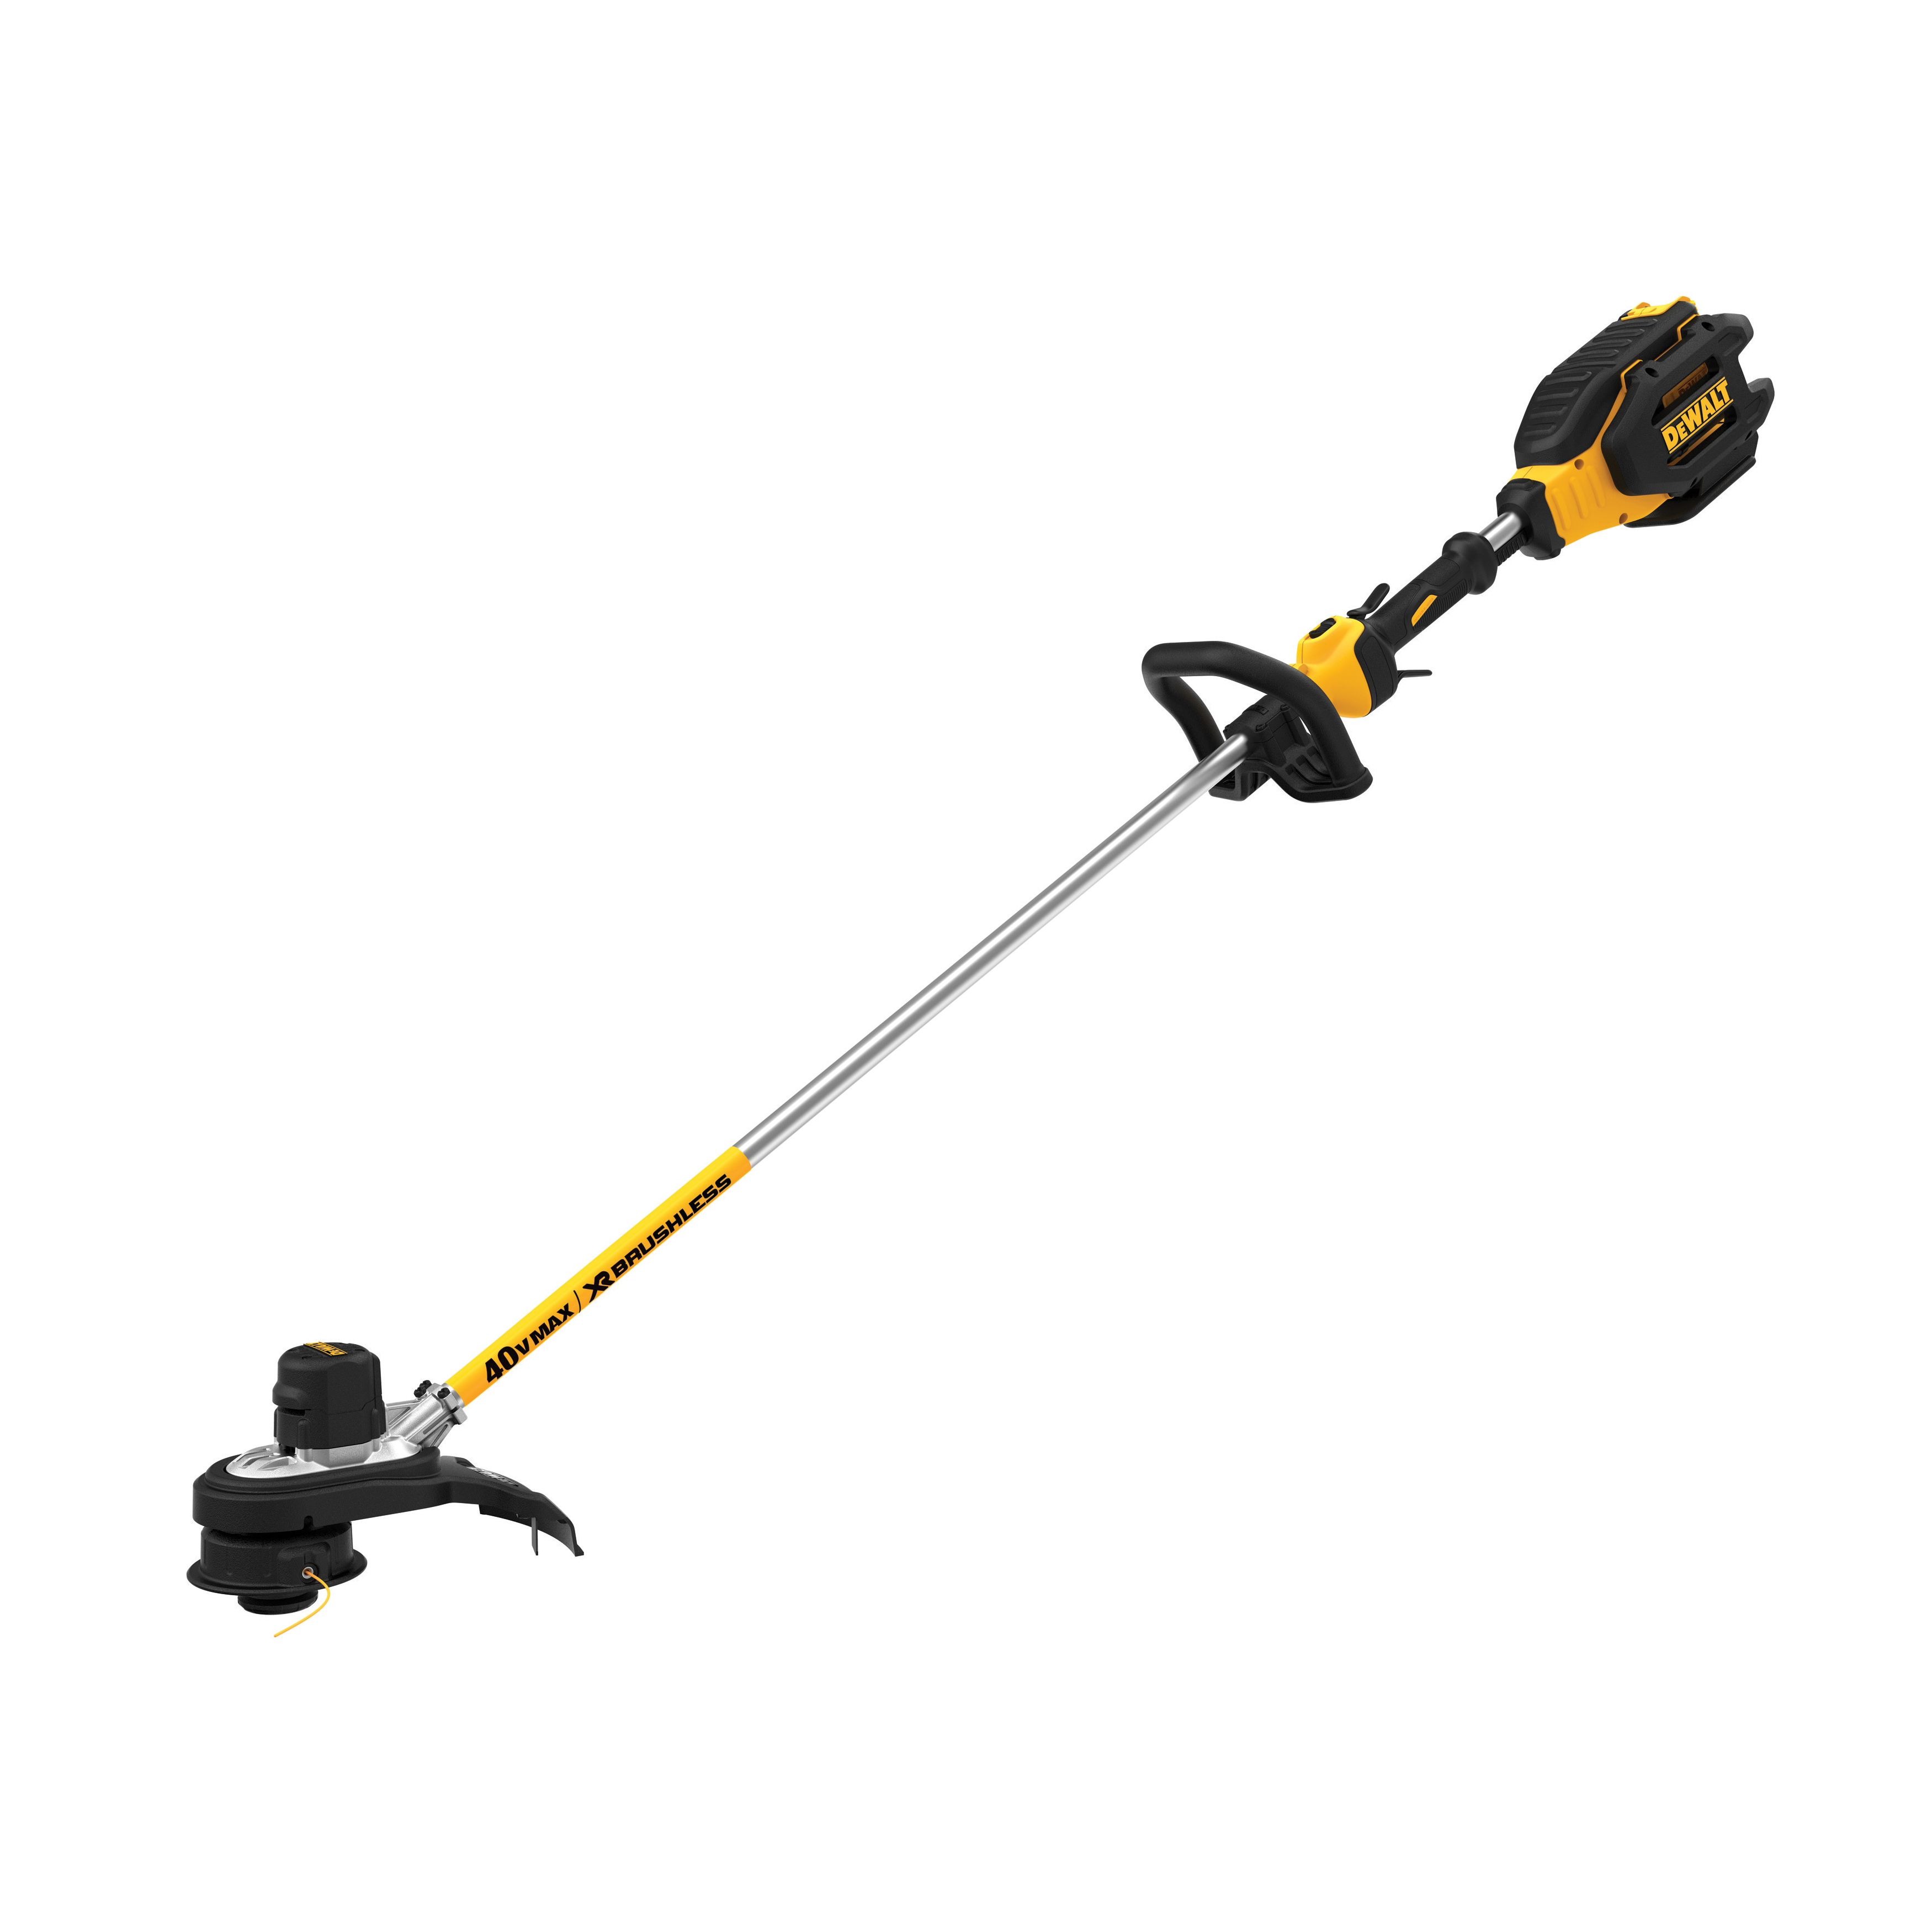 Jackson® 1272800 J-450 Caprock Round Point Pony Shovel, Tempered Steel Blade, 47 in Handle Length, Hardwood Handle